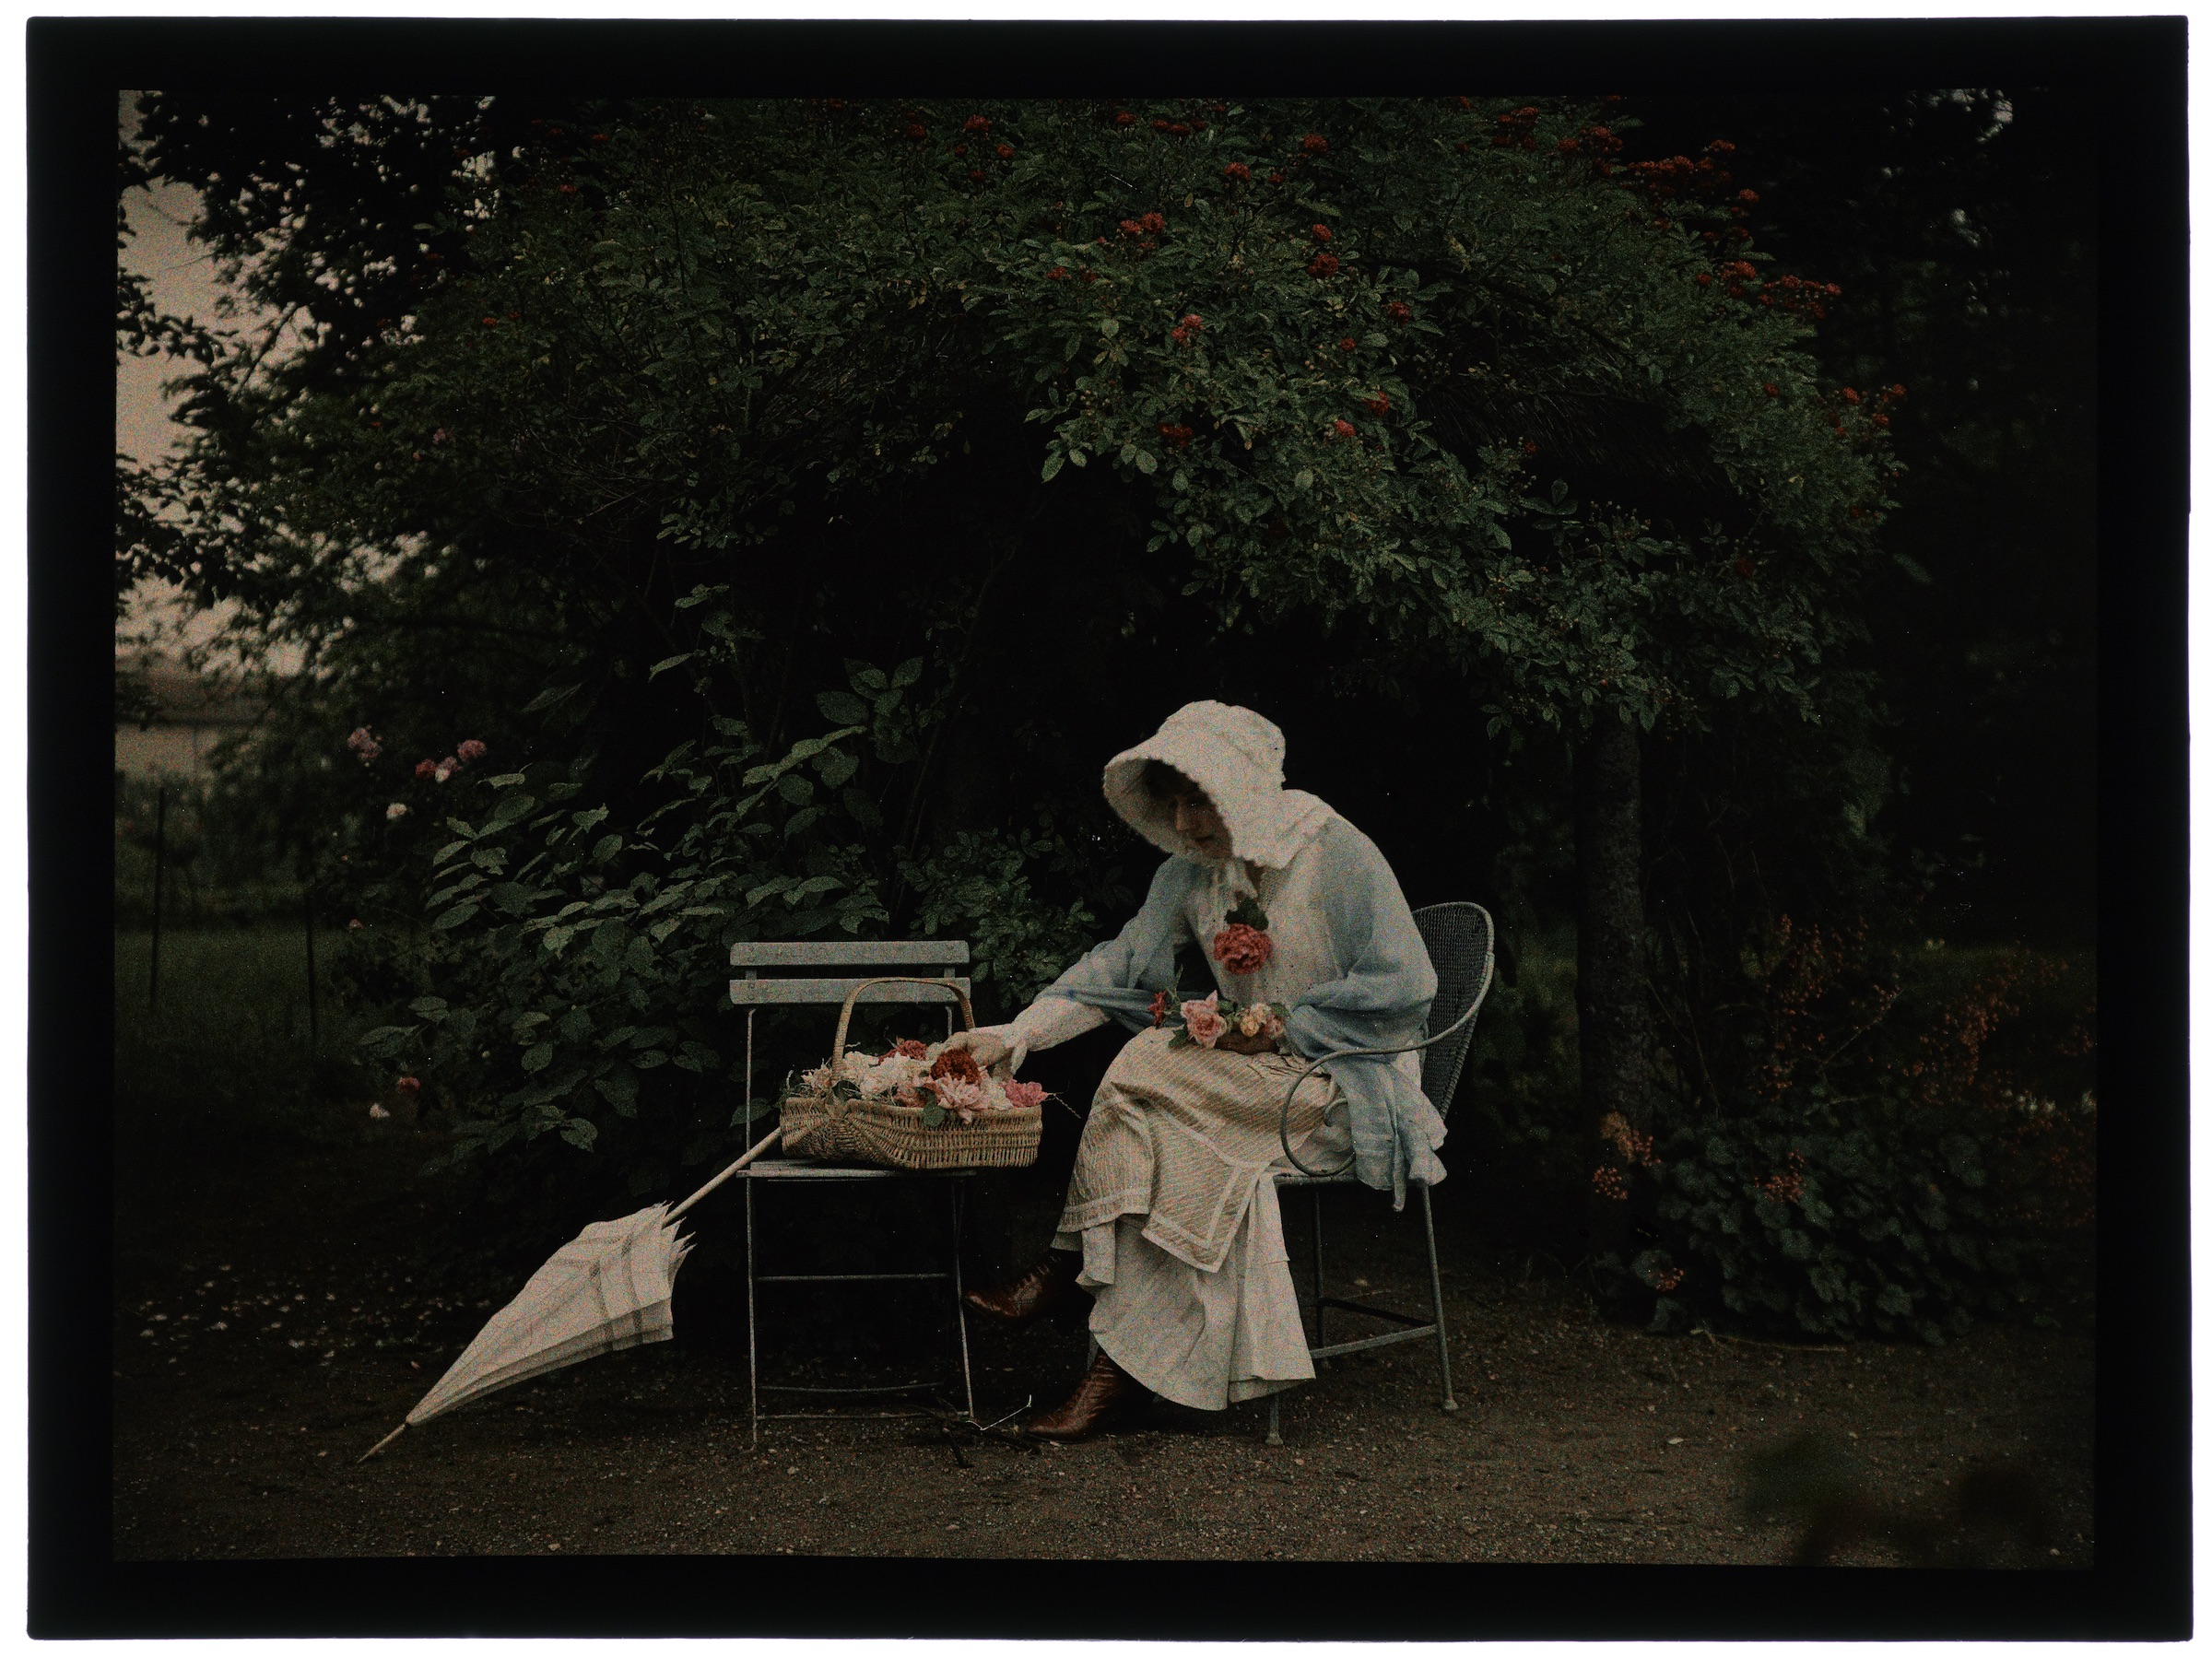 Femme en hâlette au jardin fleuri